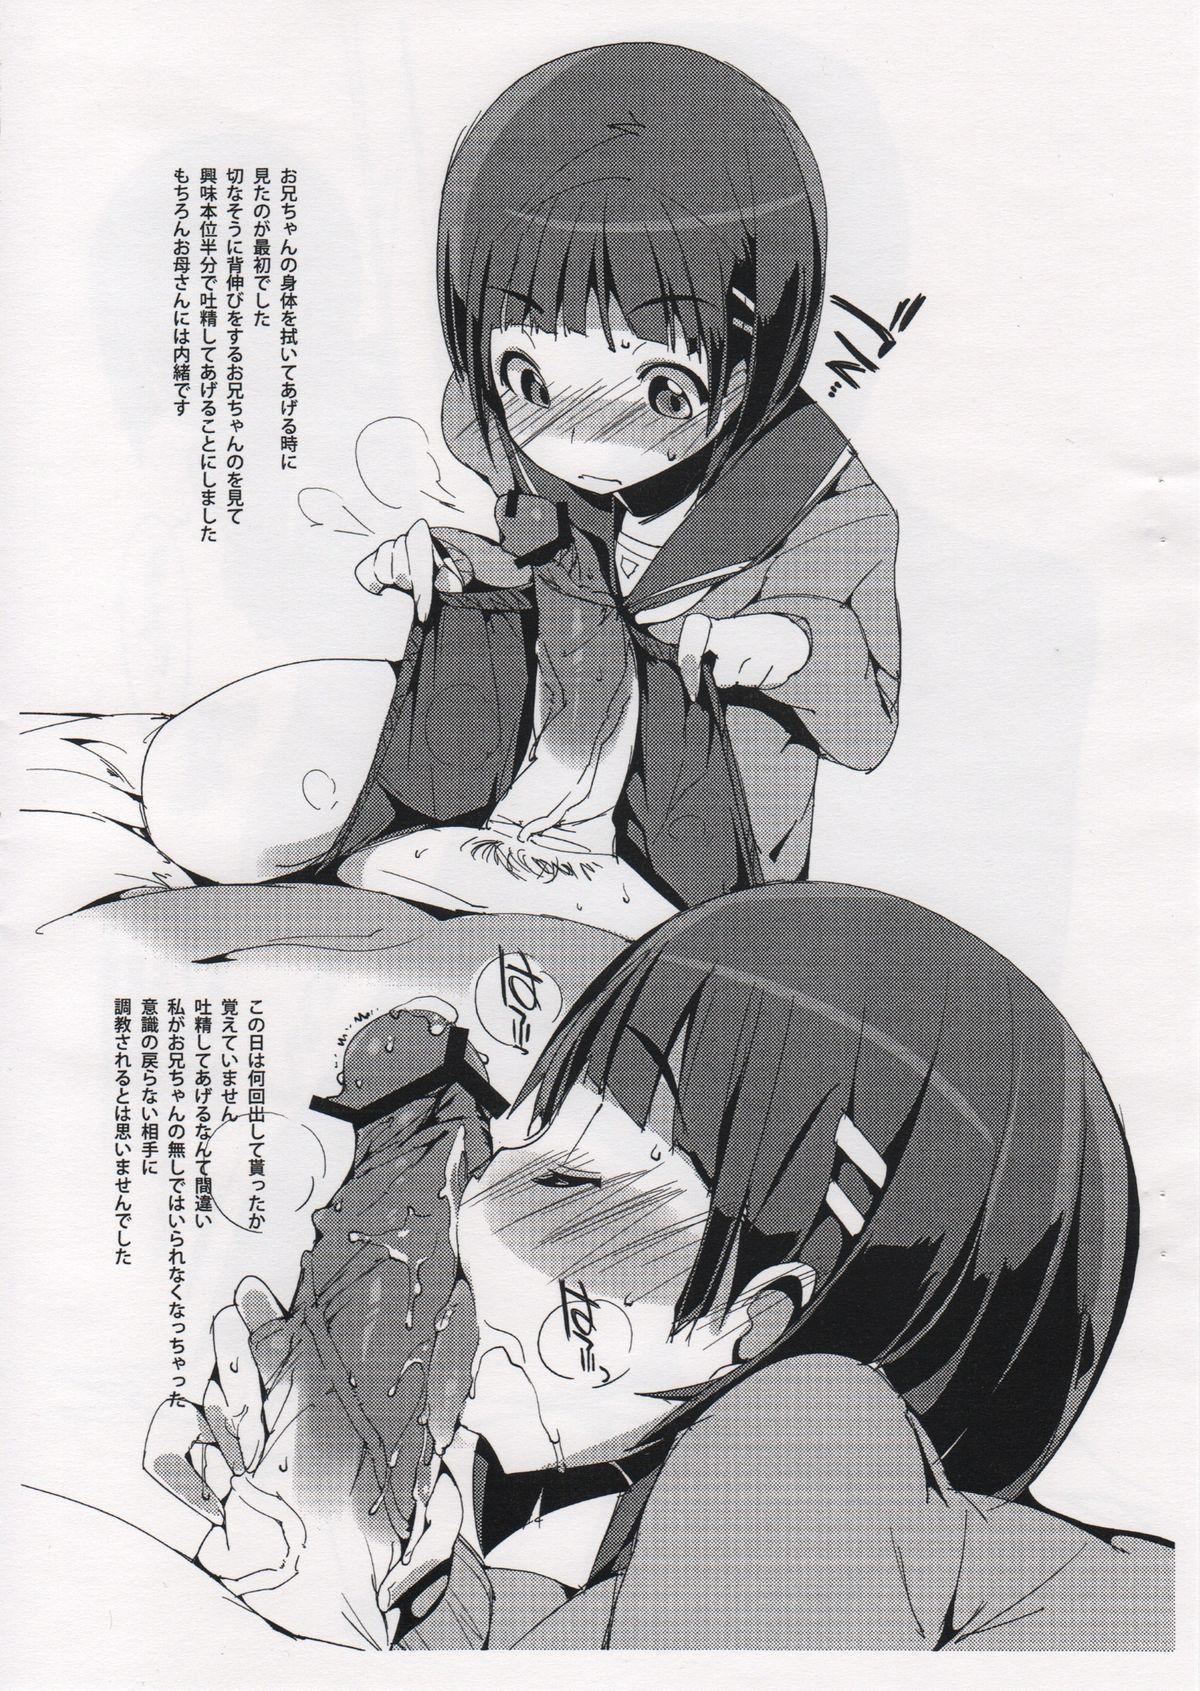 (C83) [Potato Salad (Himekuri)] Kirigaya-san-chi no Seishori Nikki. (Sword Art Online) 1